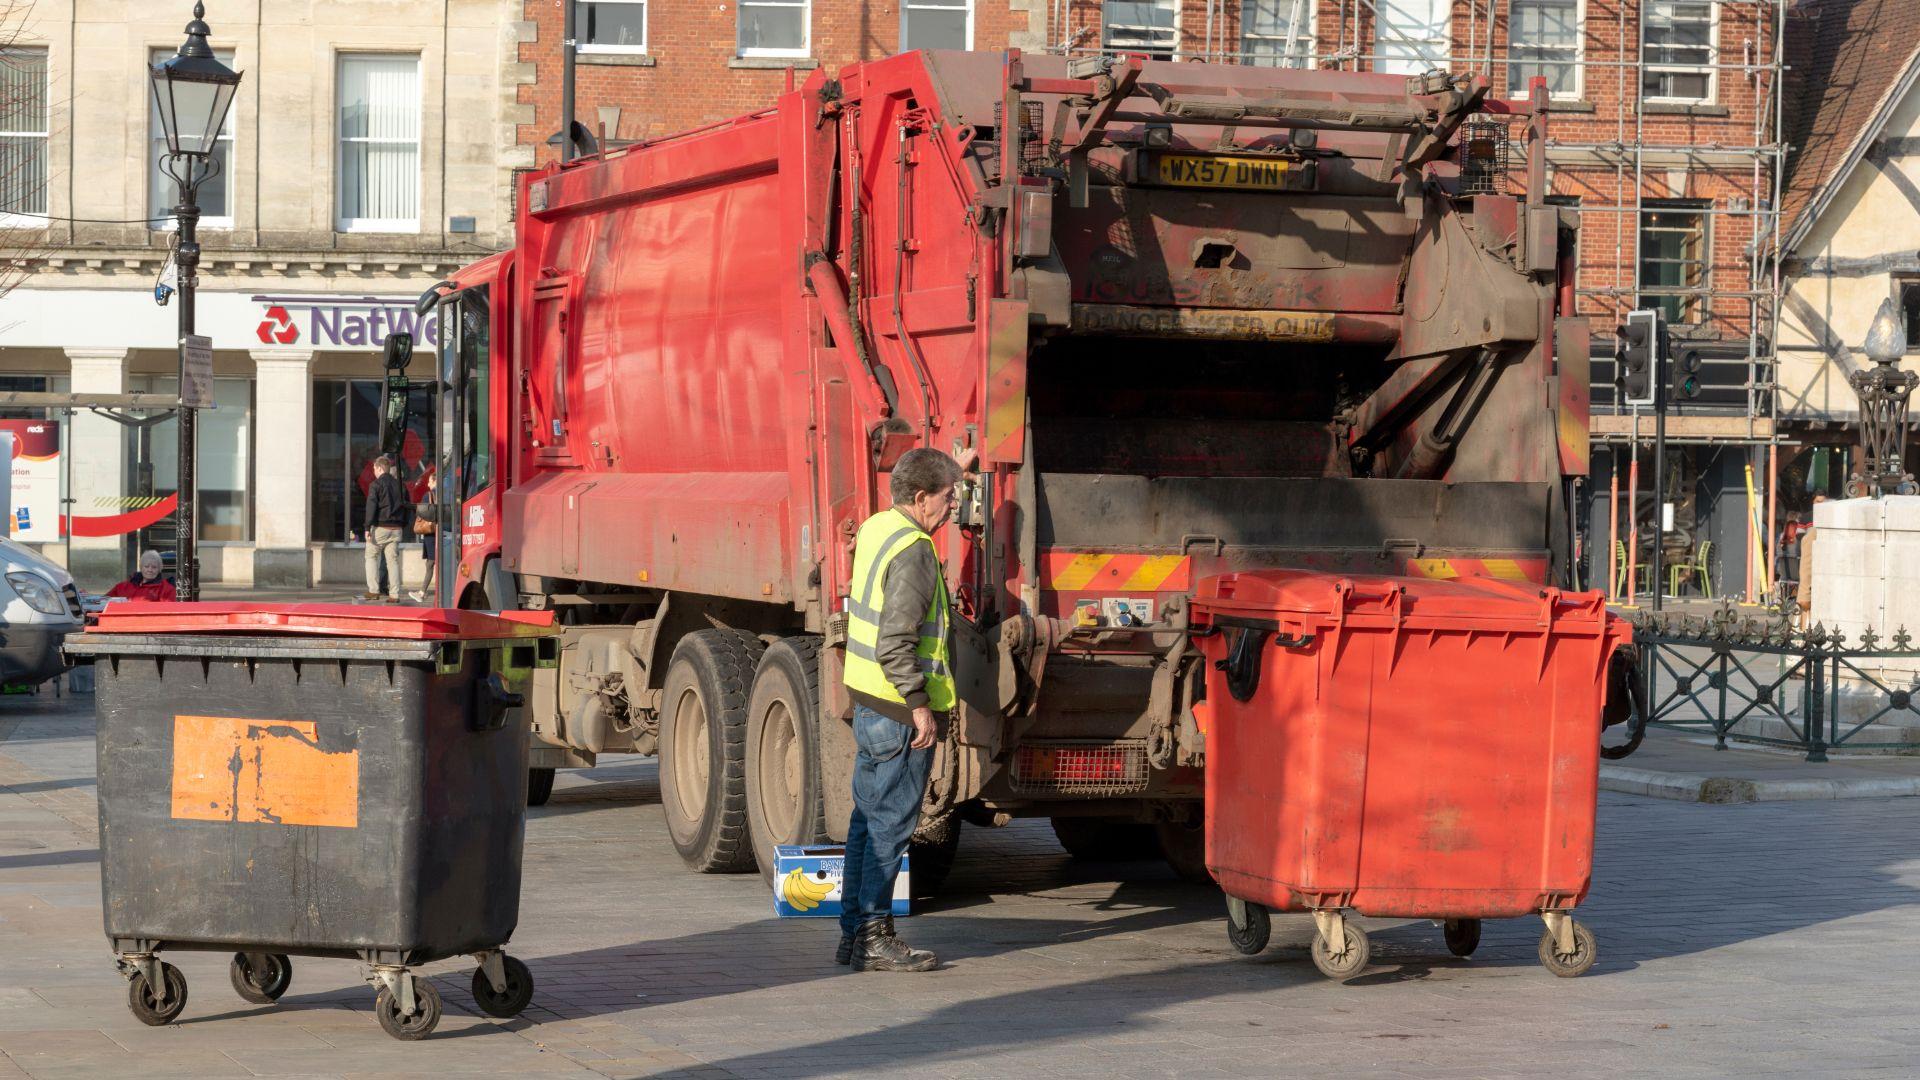 Bin lorries to play ice cream van music